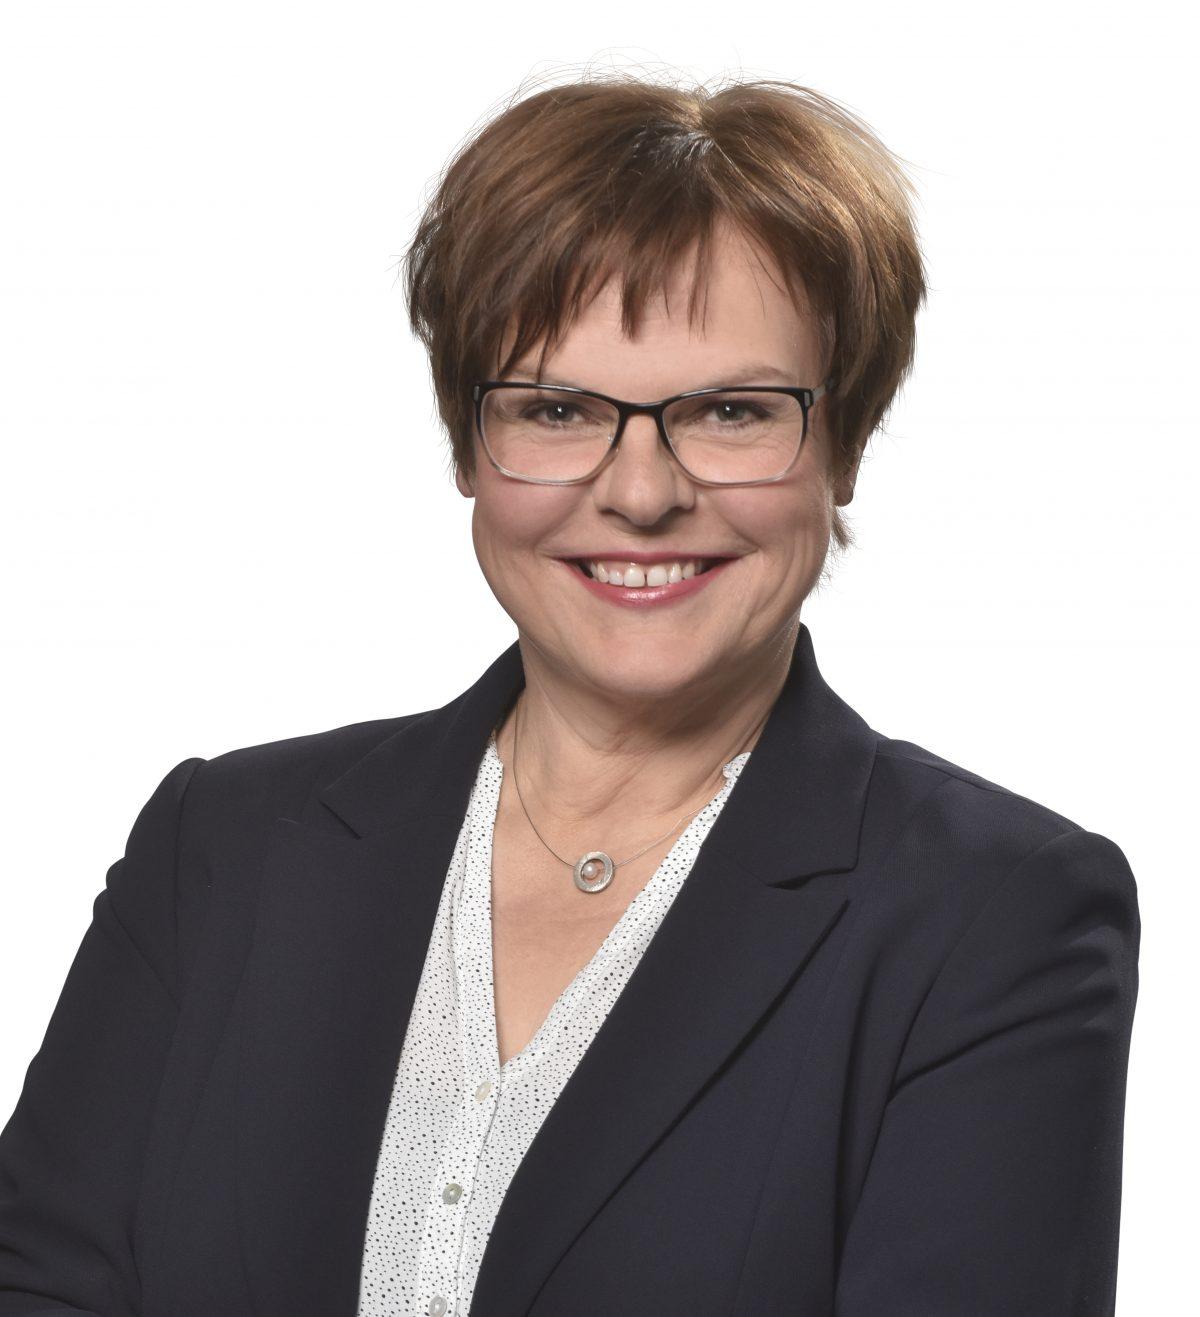 Dr. Silke Lesemann, Foto: privat